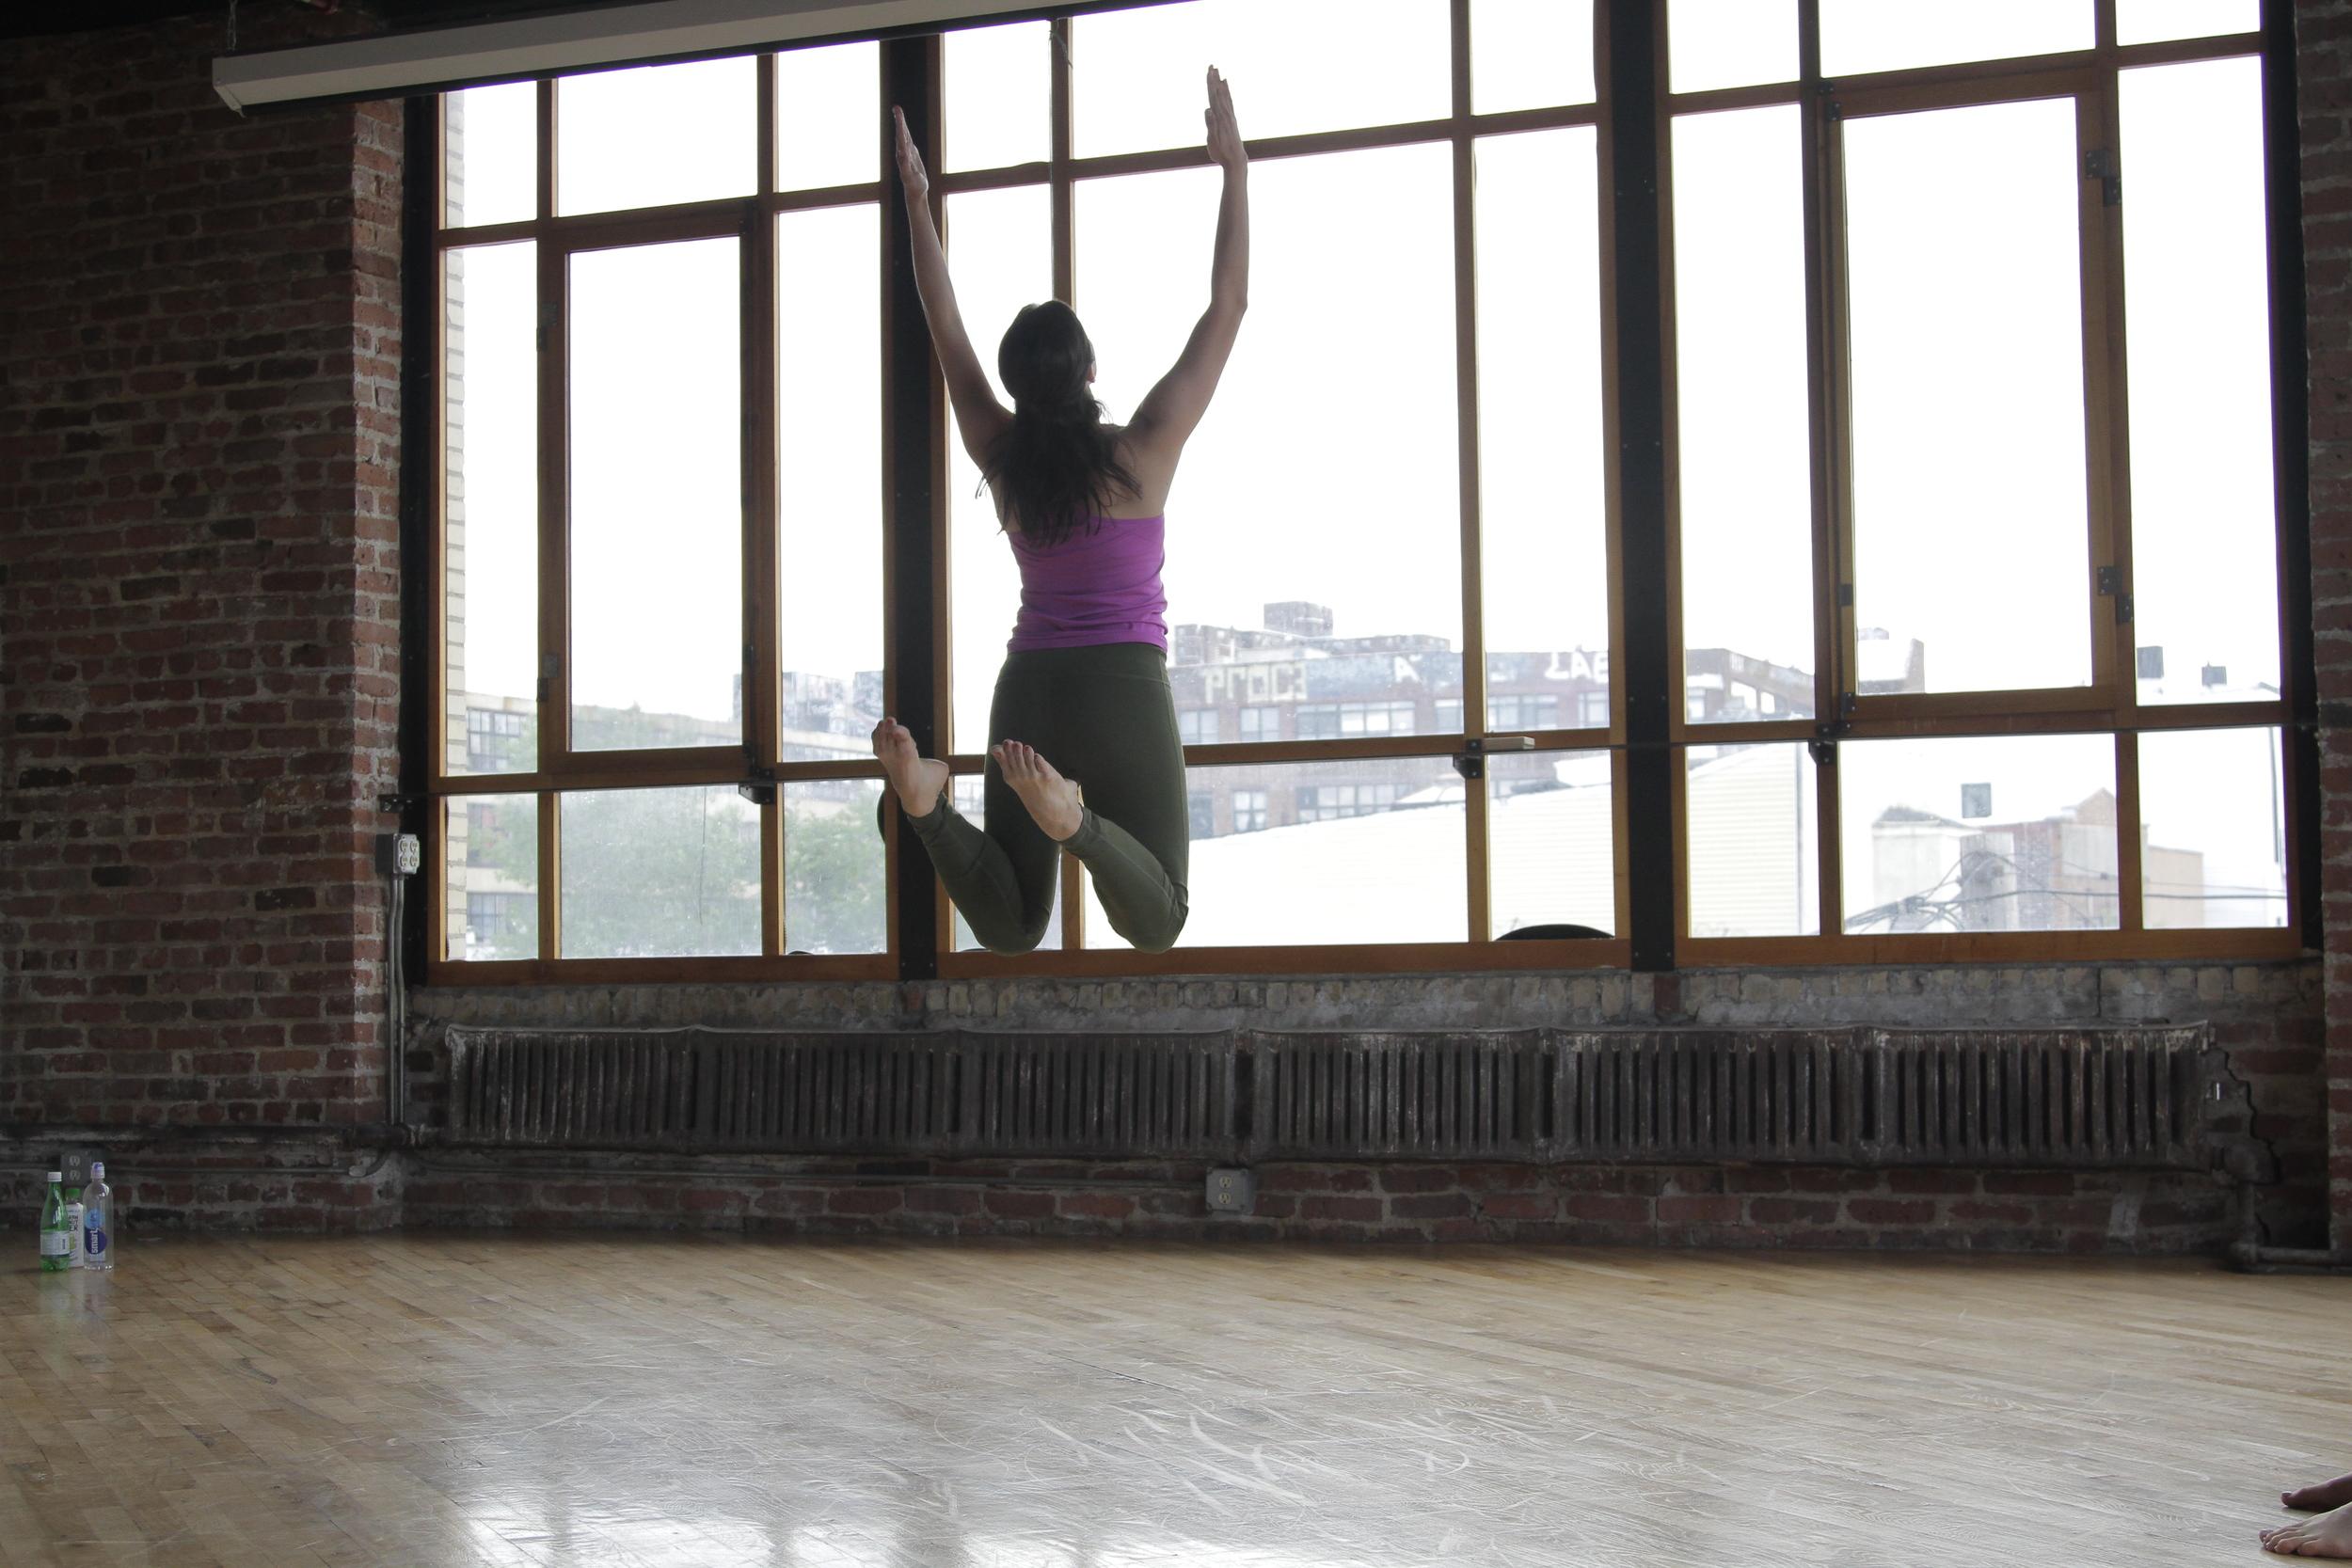 Photo by: Bradley Buehring  Danced by: Julia Radomyski